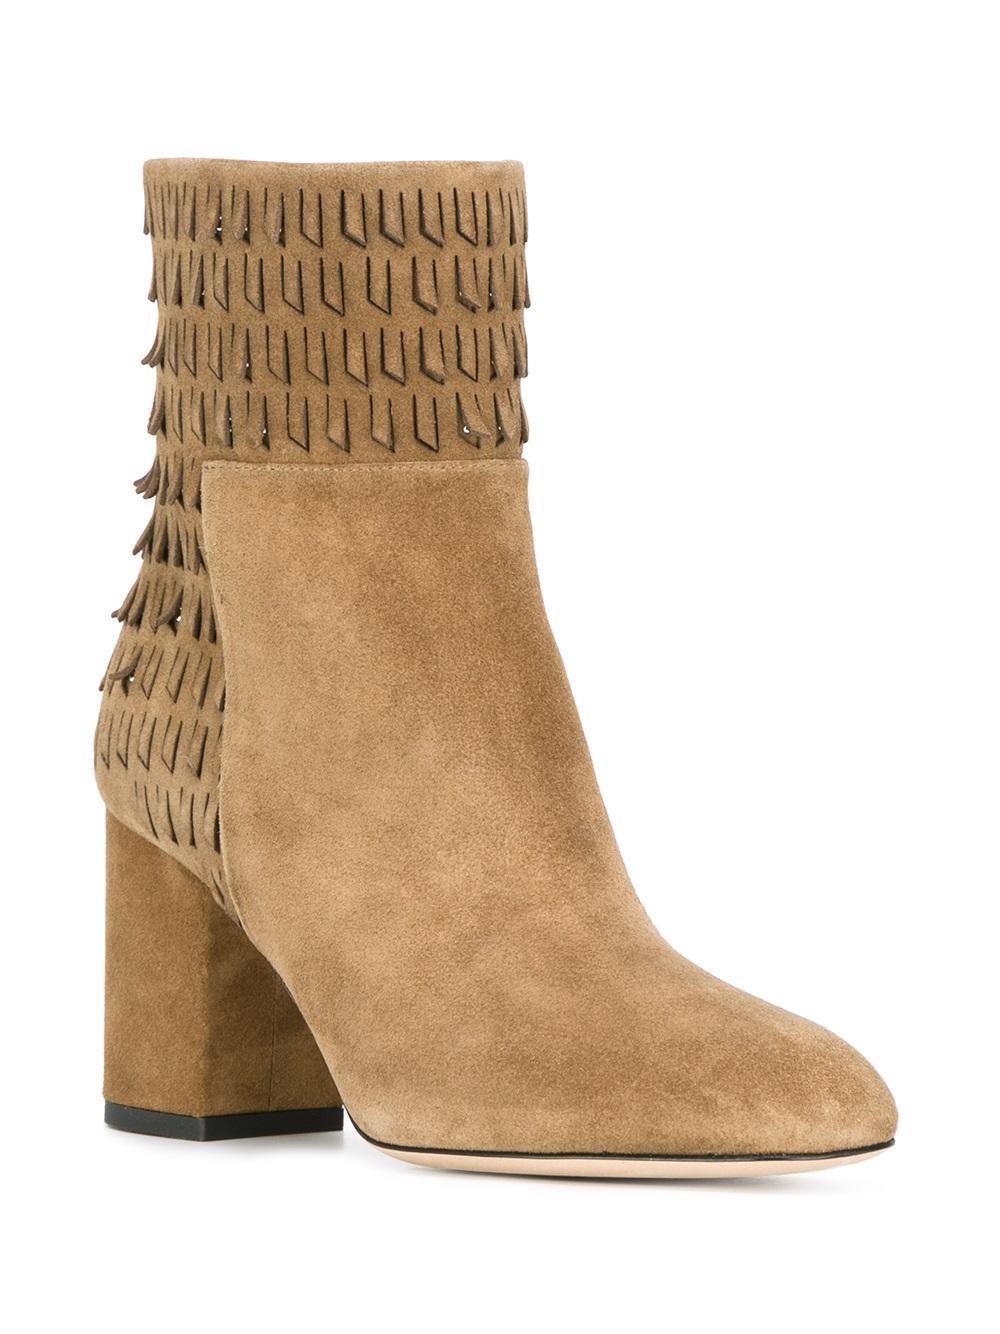 Lyst Elie Saab Fringed Detailing Ankle Boots